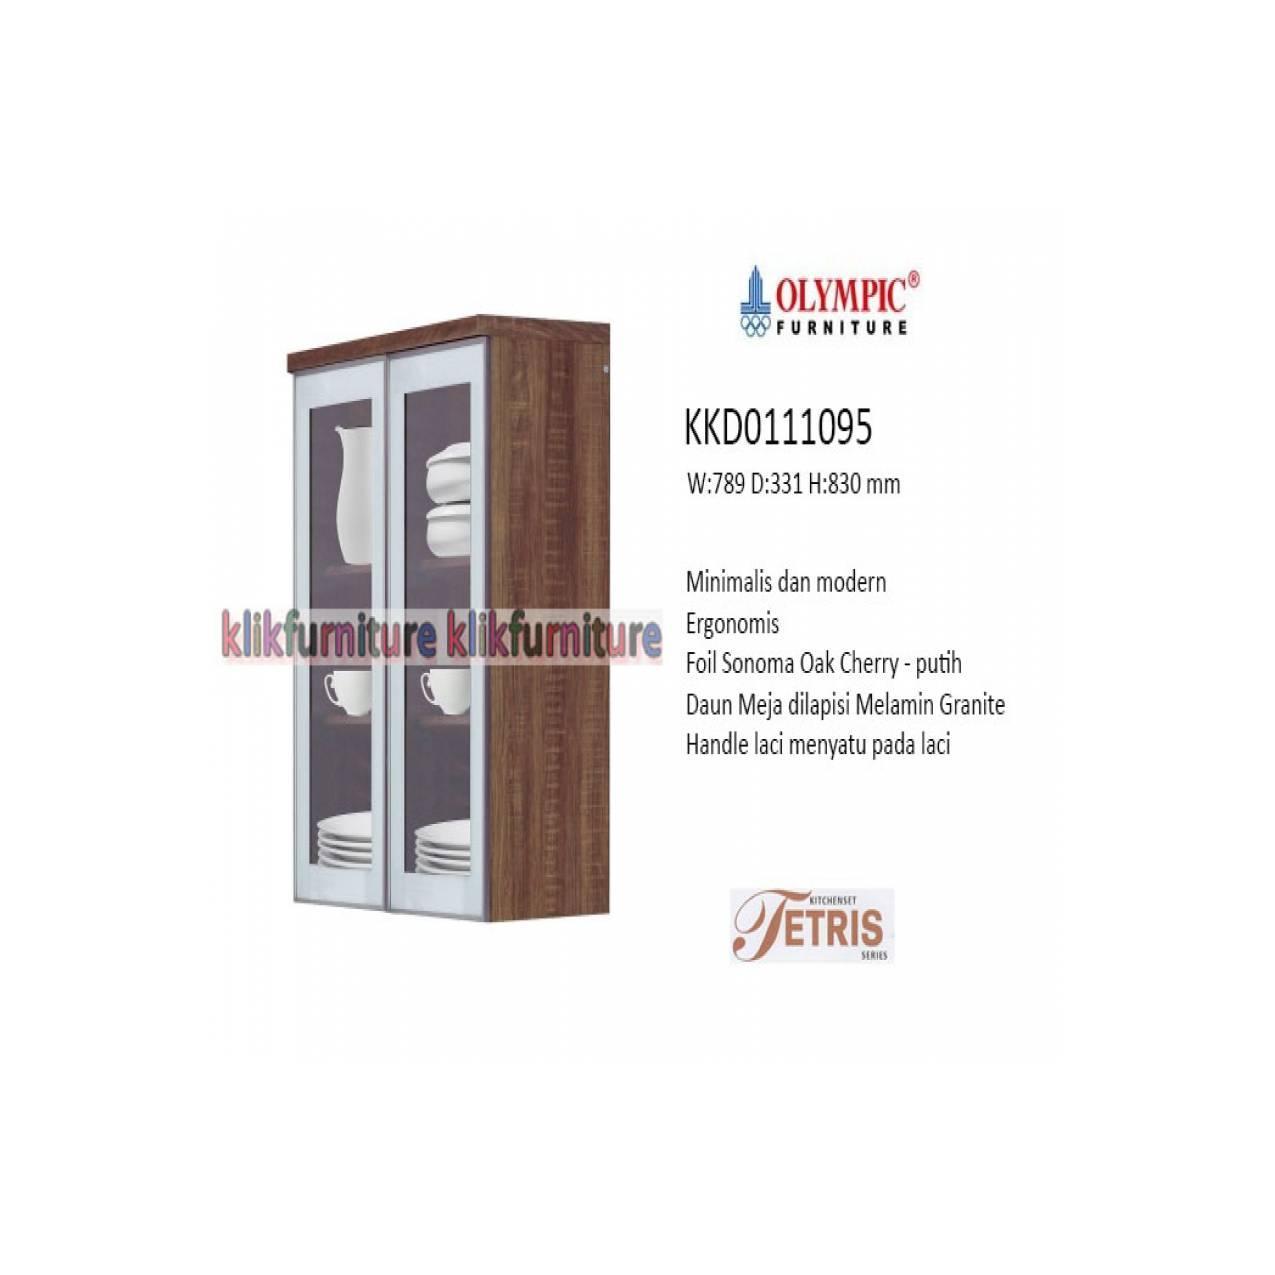 KKD 0111095 TETRIS Olympic Kitchen Set